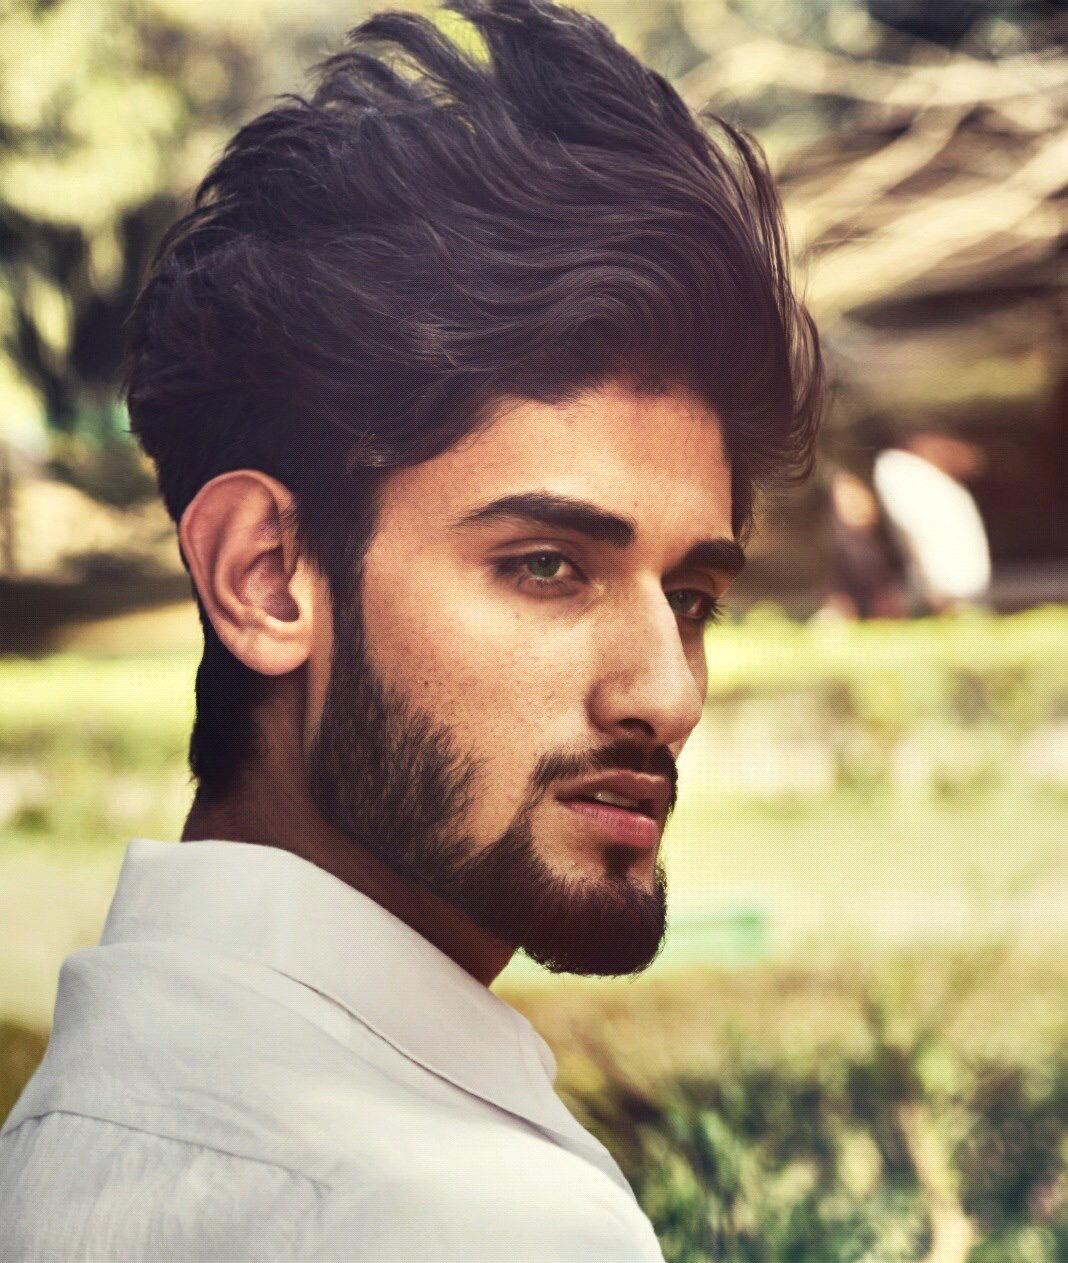 02346_ANIL_SINGH_DELHI_IMM_Indin_Male_Model